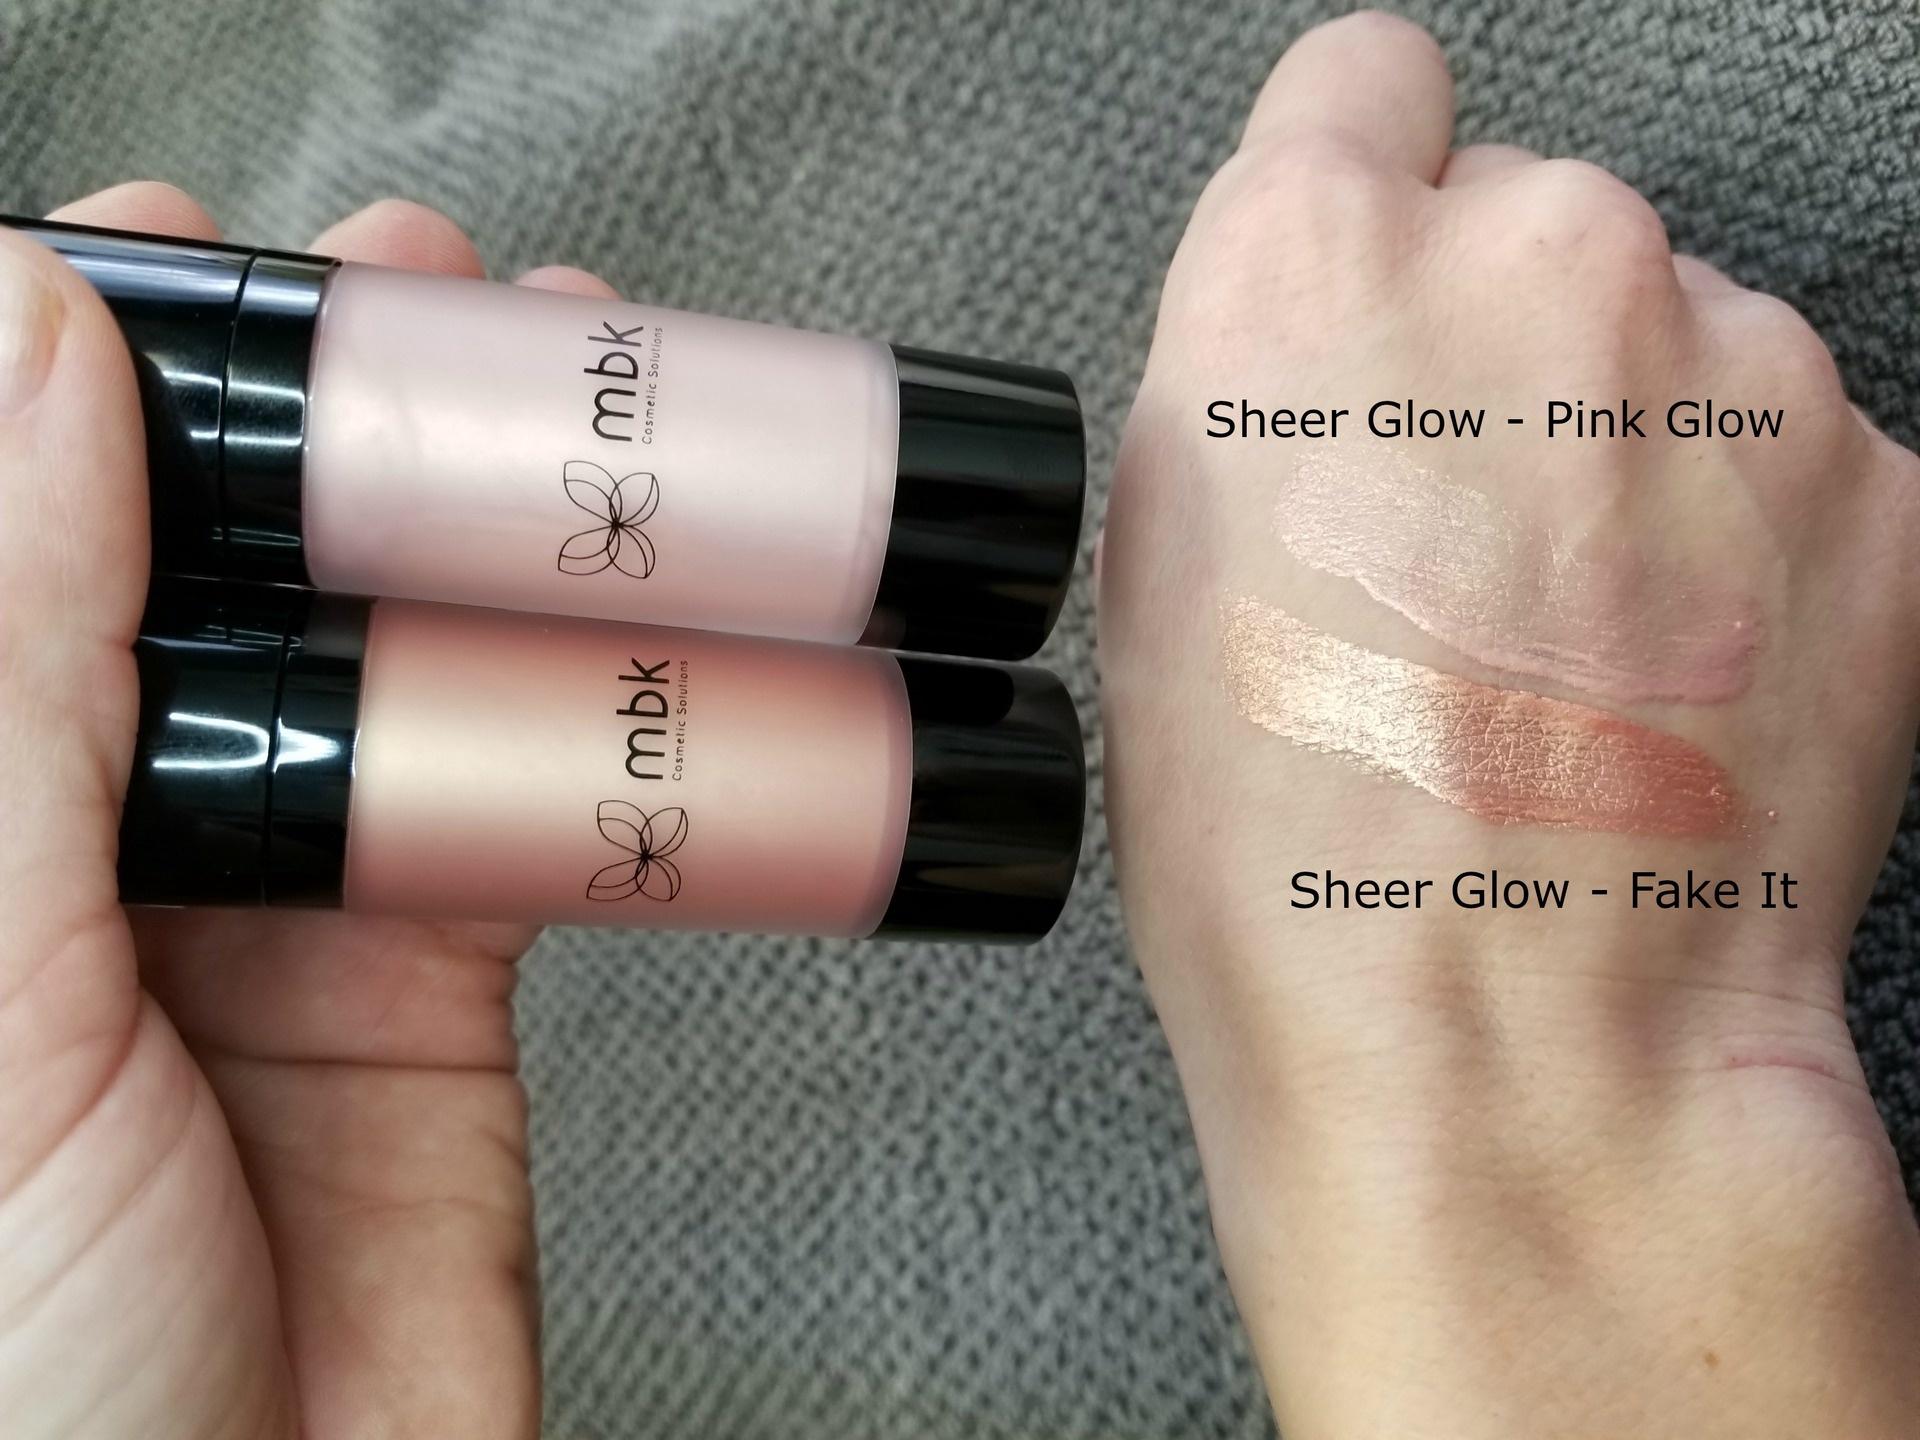 Sheer Glow - Pink Glow